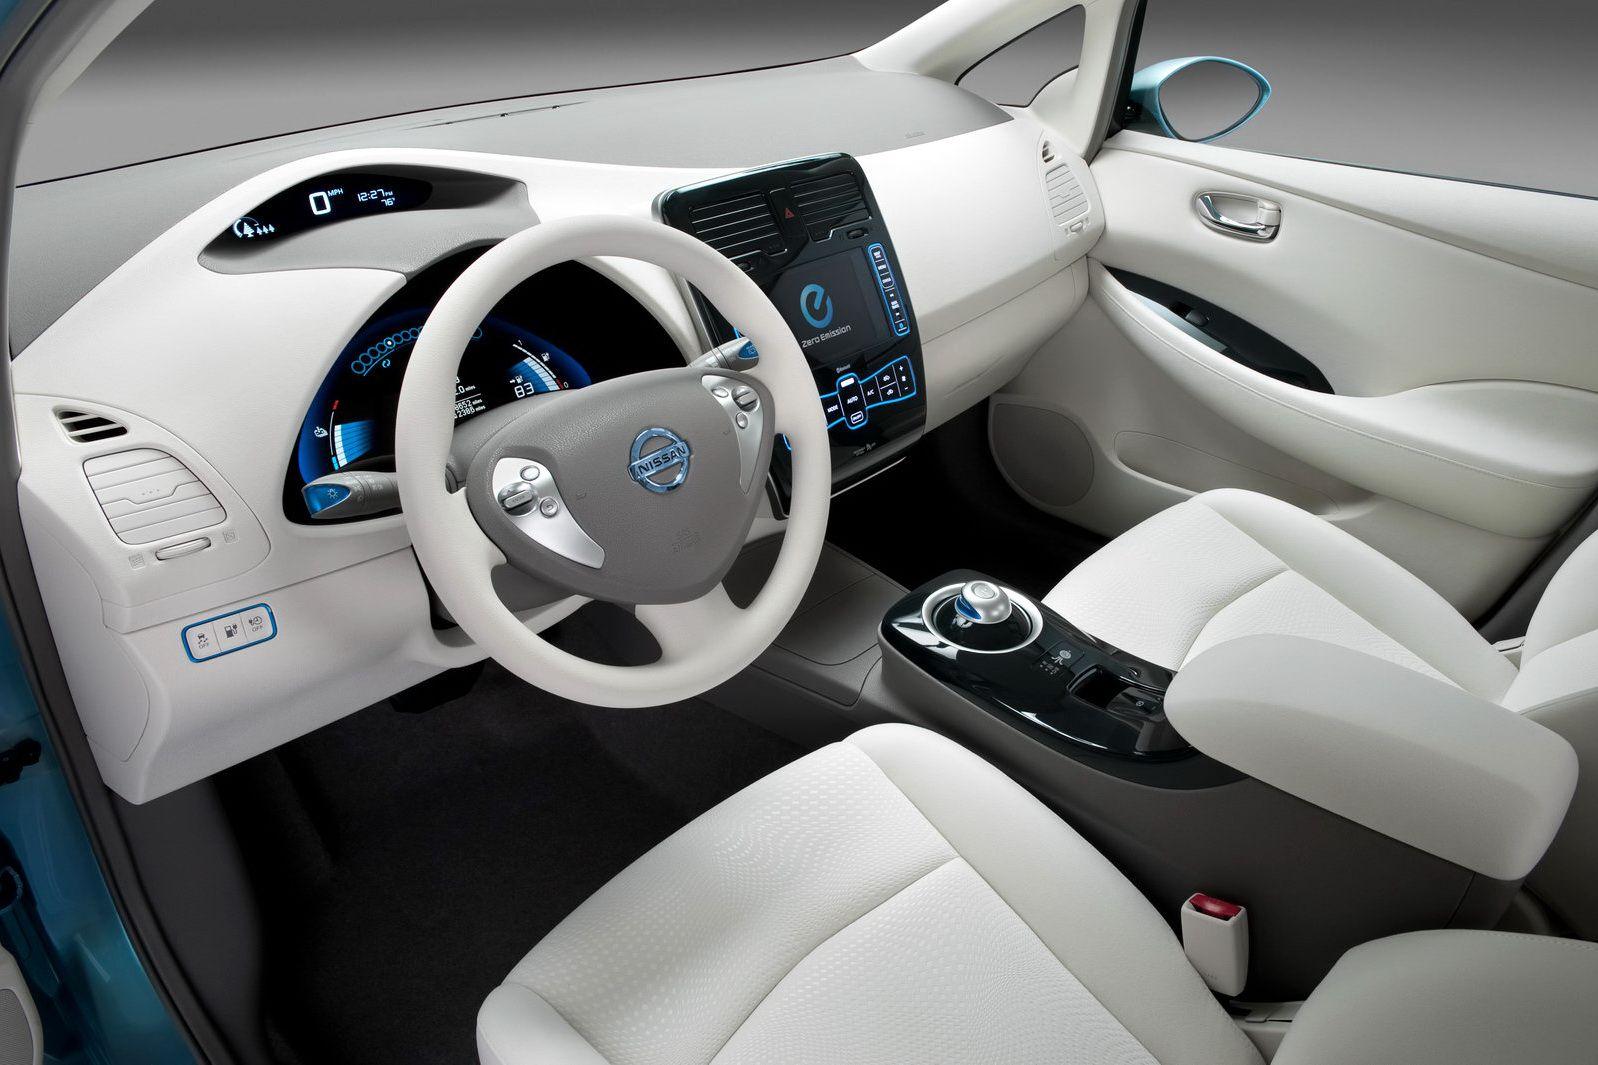 Nissan Leaf My Next Eco Friendly Car The Inside